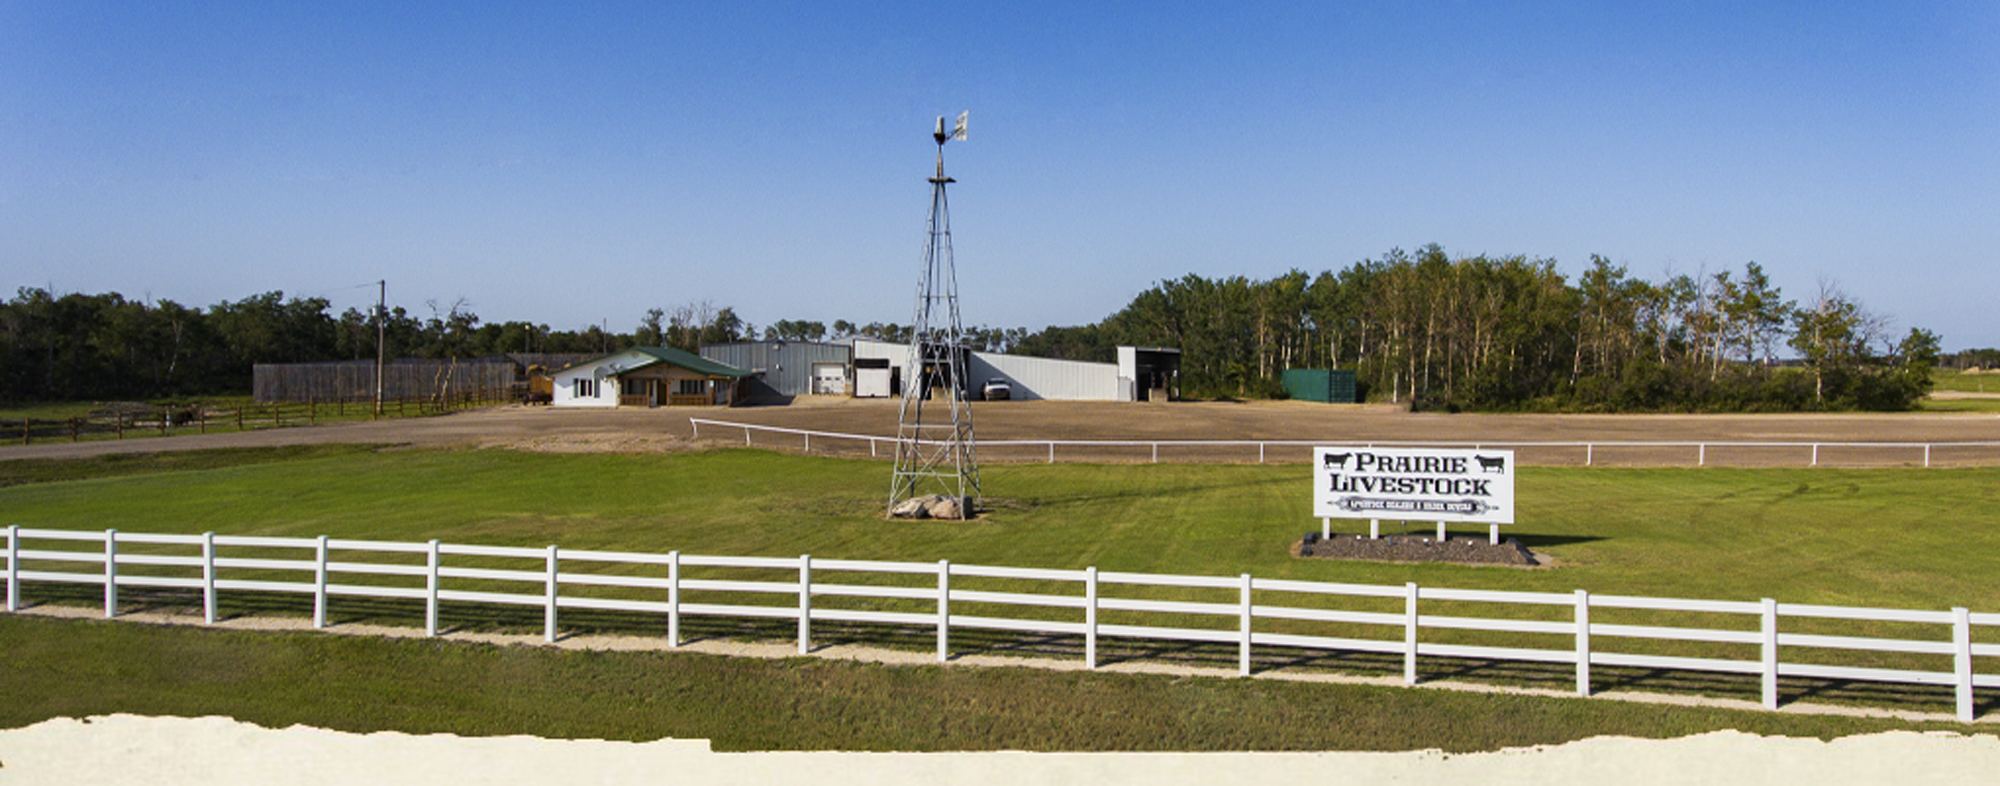 prairie-livestock-banner-11